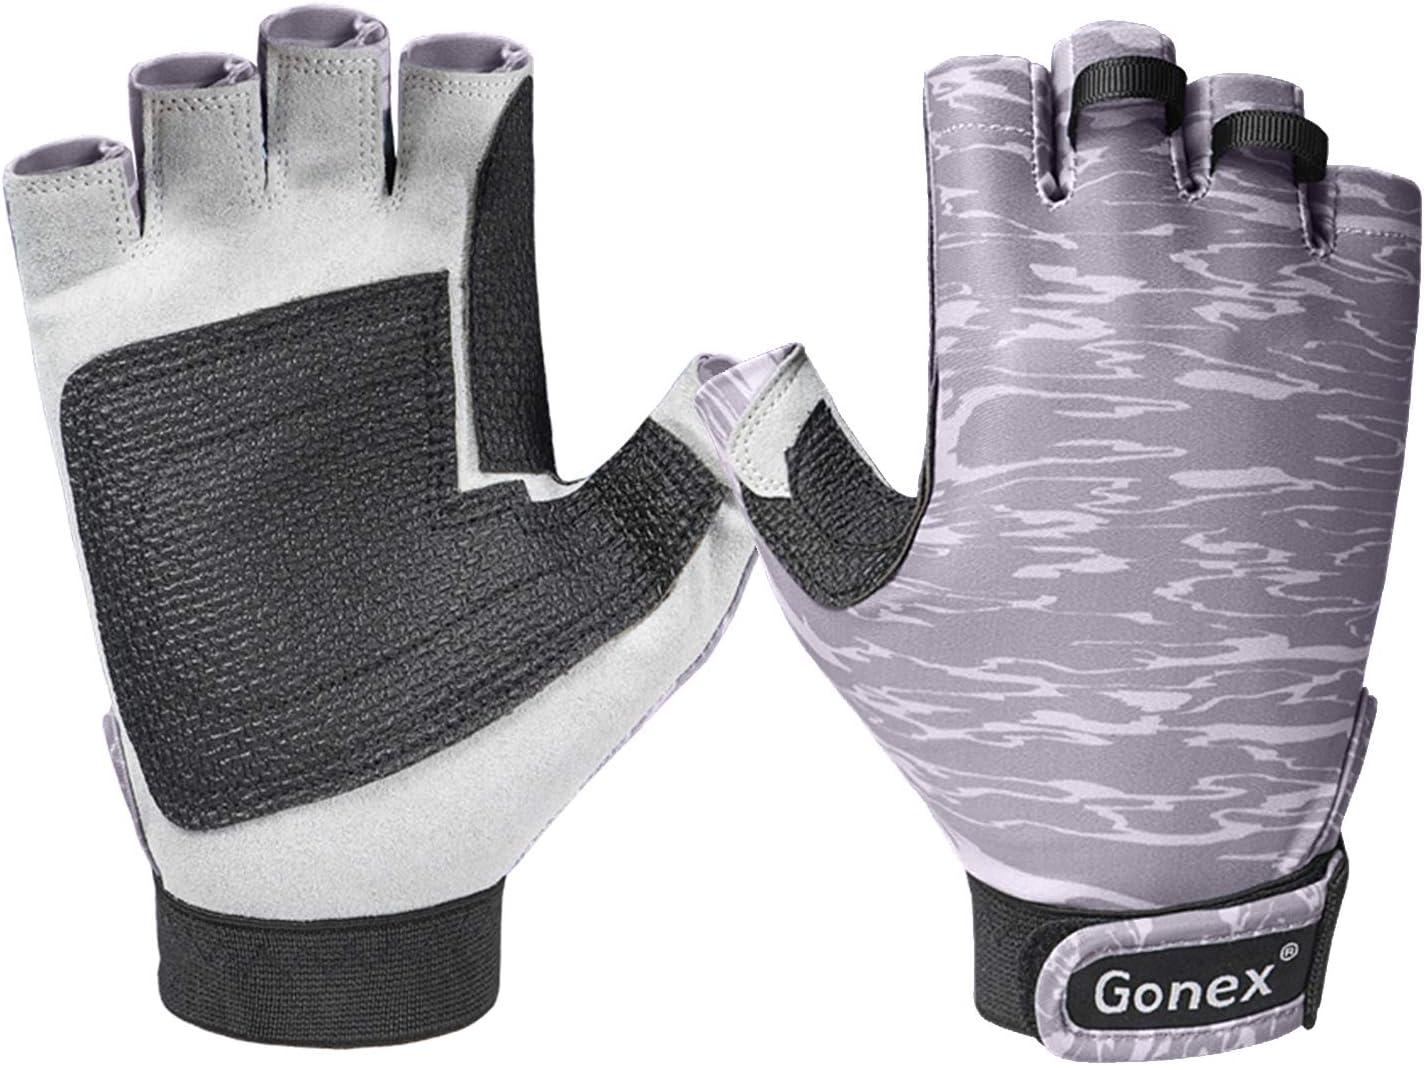 kayak protecci/ón solar UPF 50+ palma Guantes de pesca Gonex guantes sin dedos para hombres y mujeres palma palma de PVC